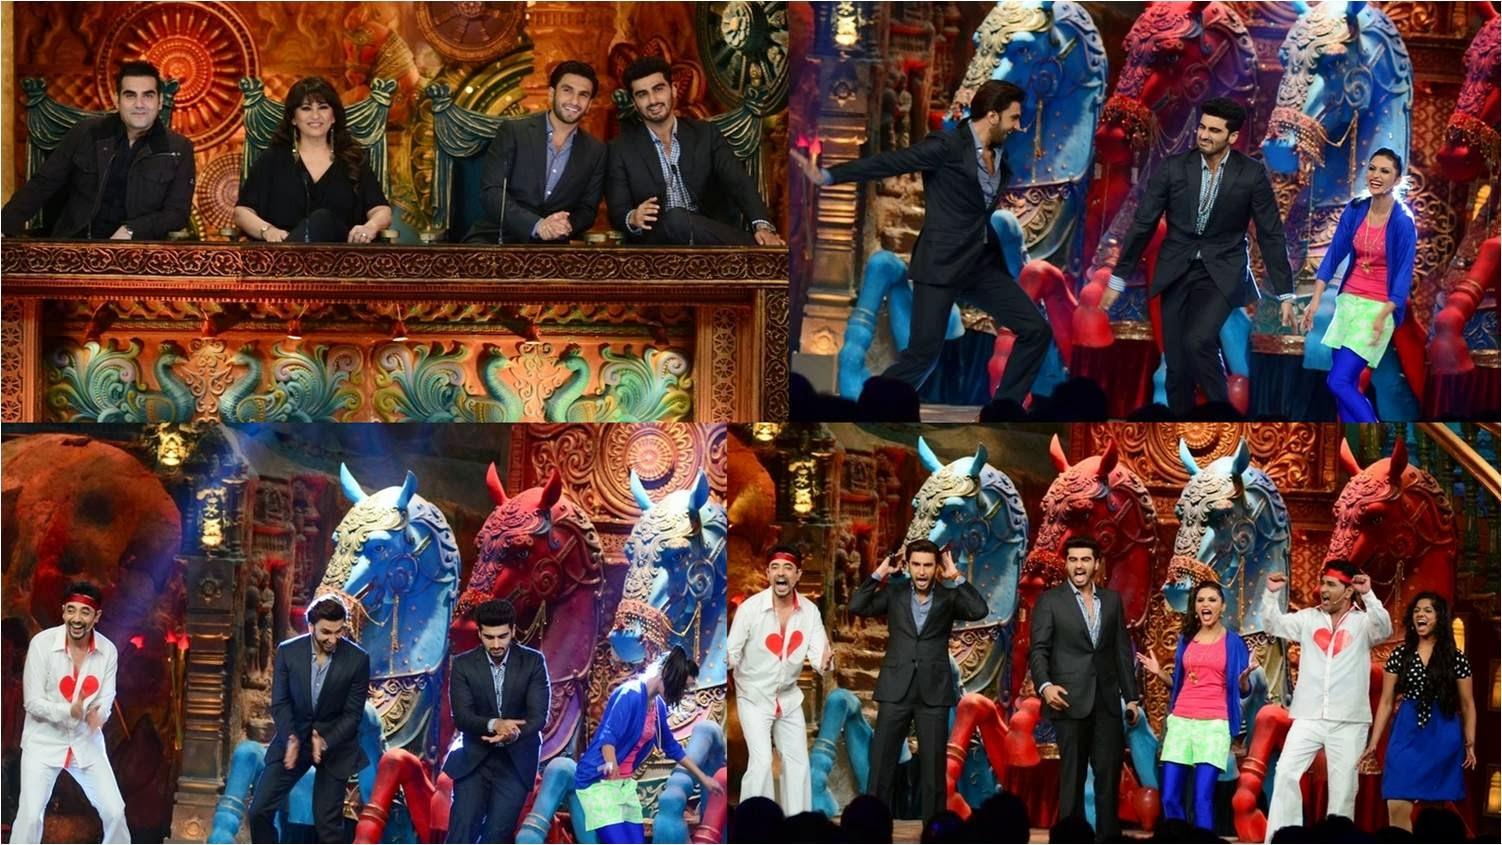 Arjun Kapoor, Priyanka Chopra and Ranveer Singh at Comedy Circus